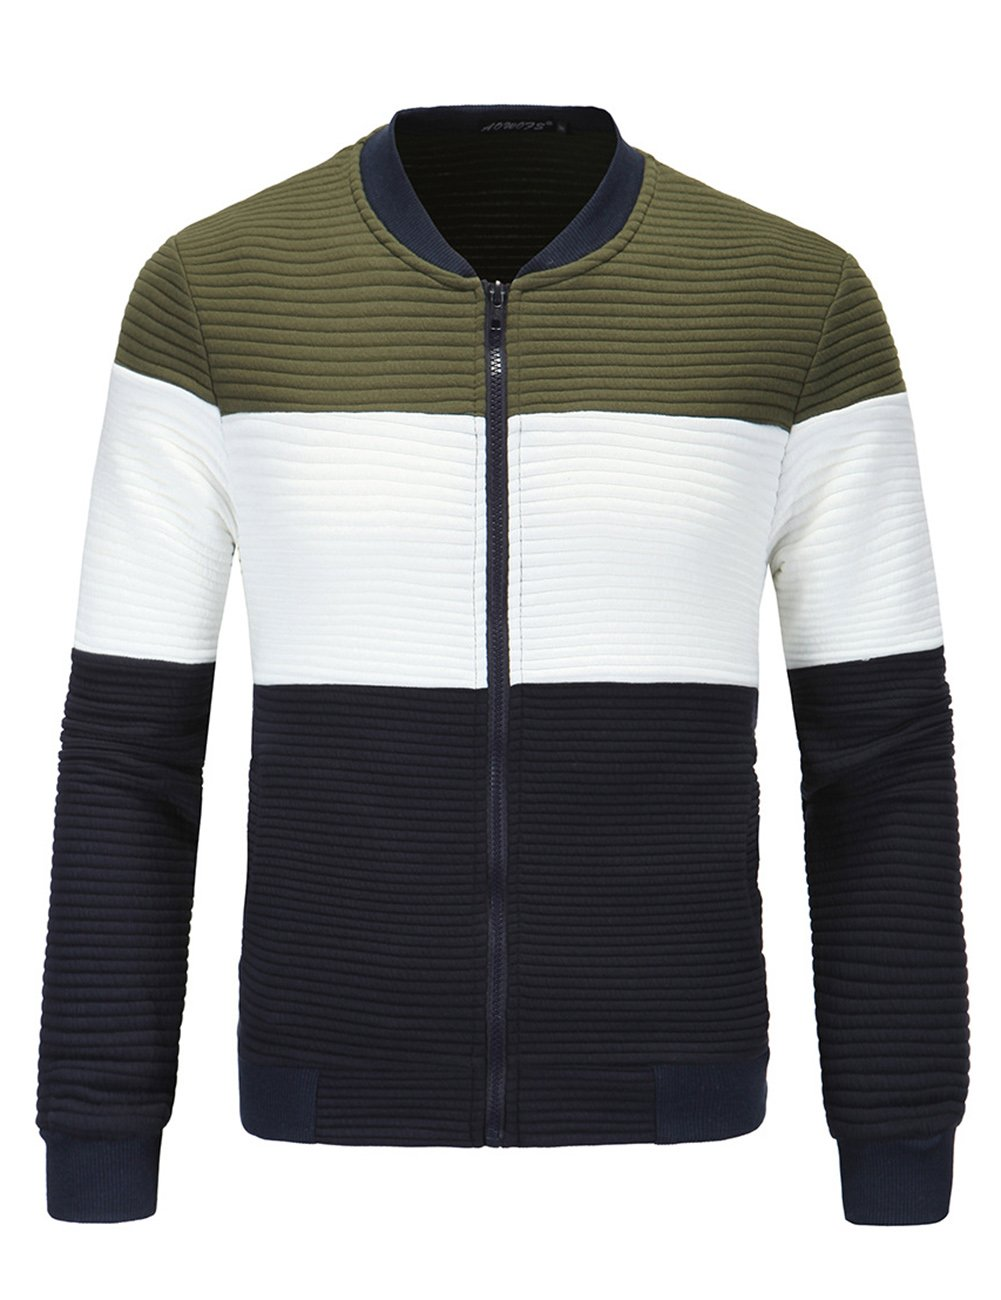 Men's European Style Fashion Cardigan Stand Collar Slim Jacket Green 3XL